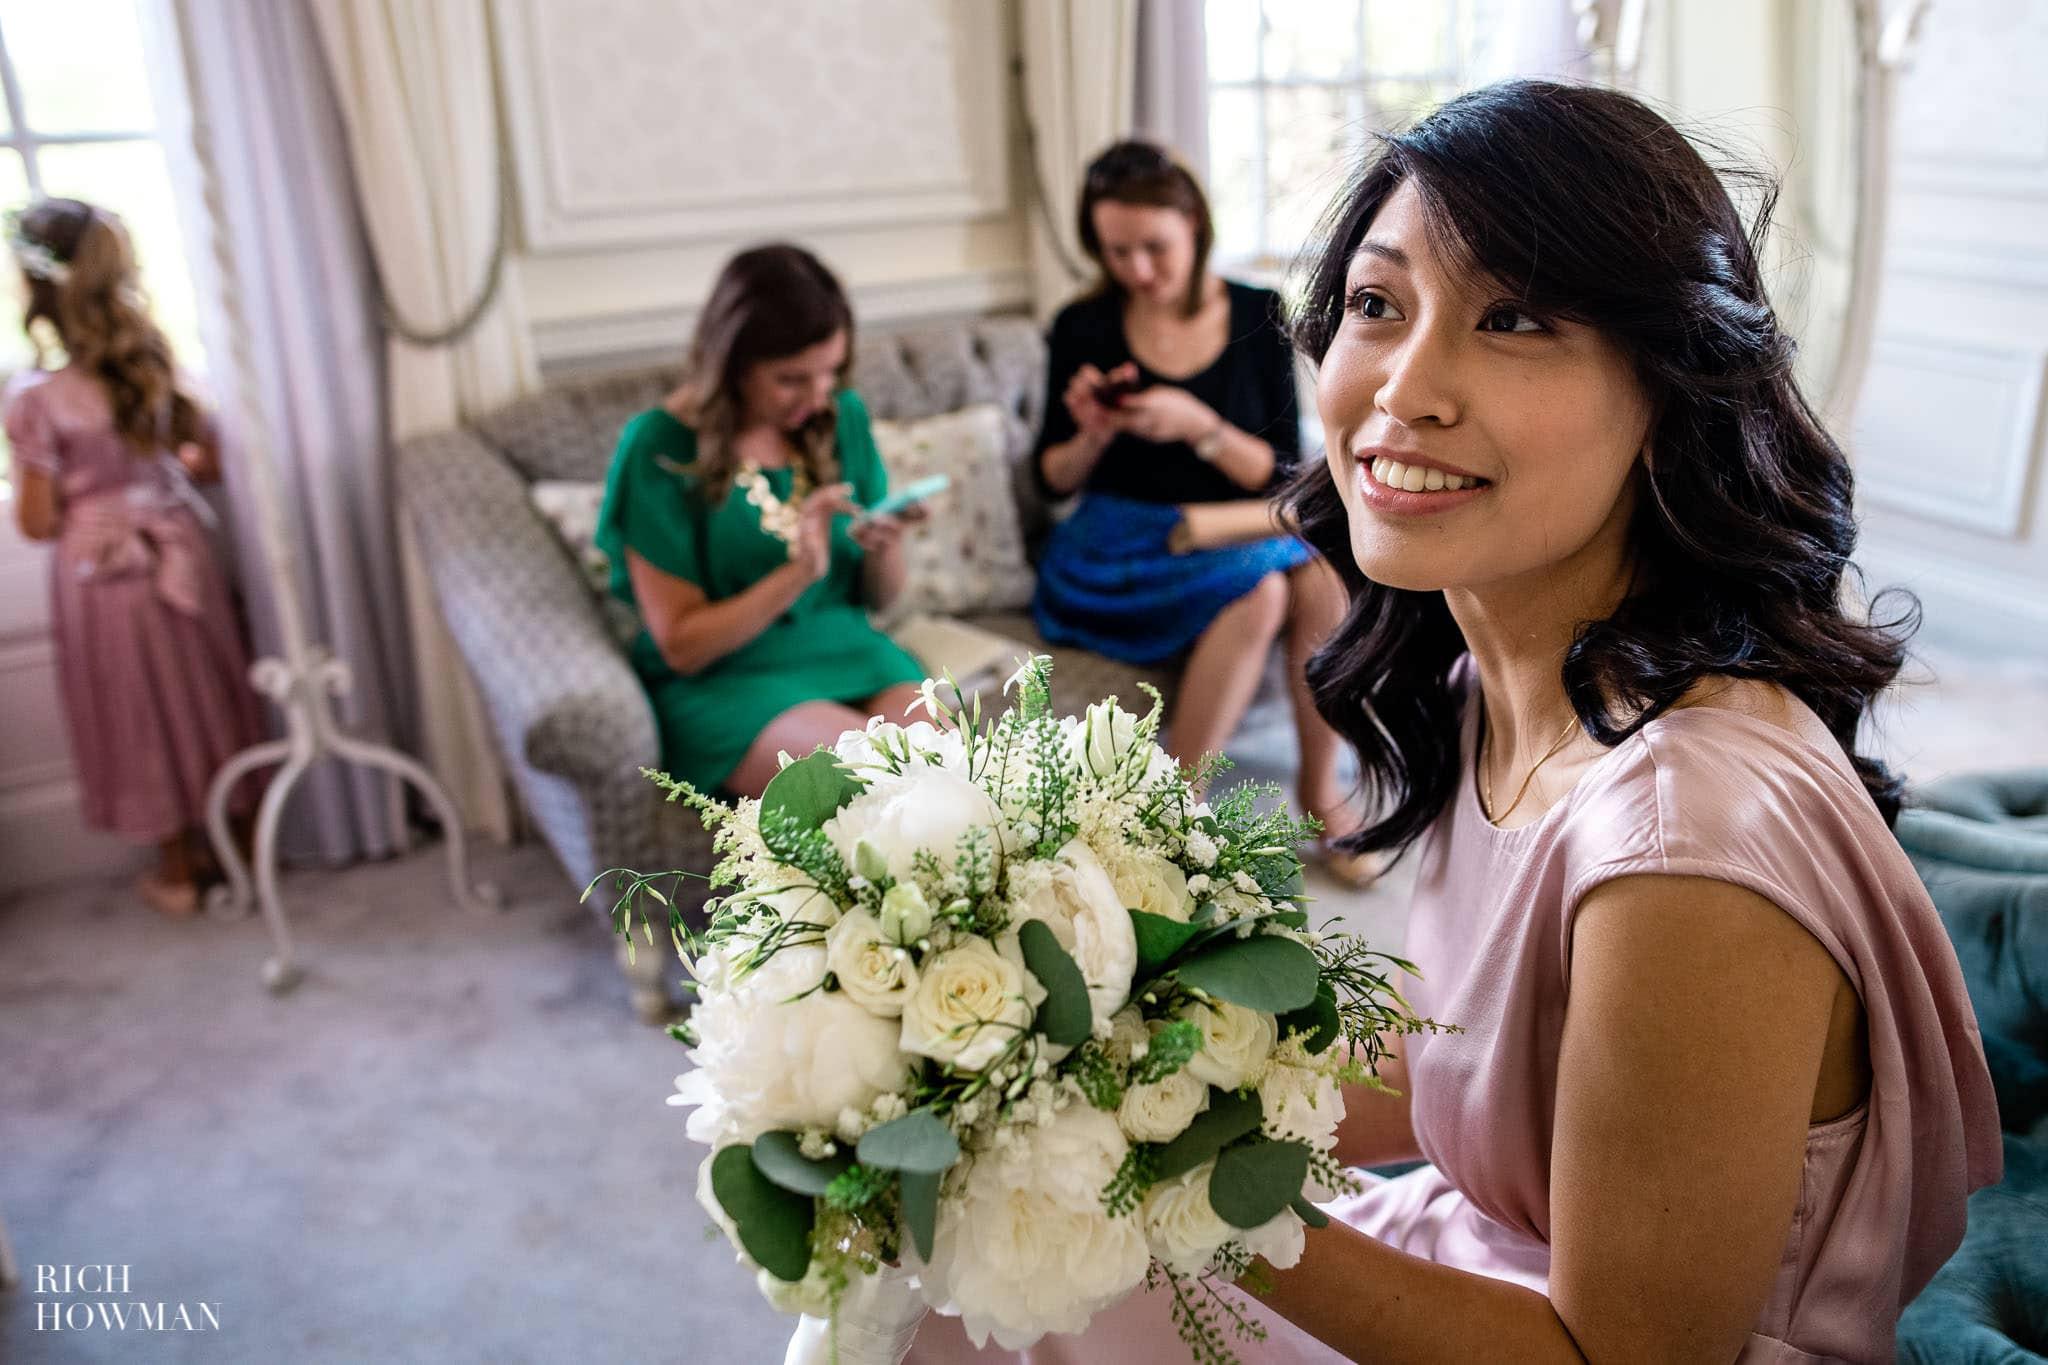 Hedsor House Wedding Photographer in Berkshire 29